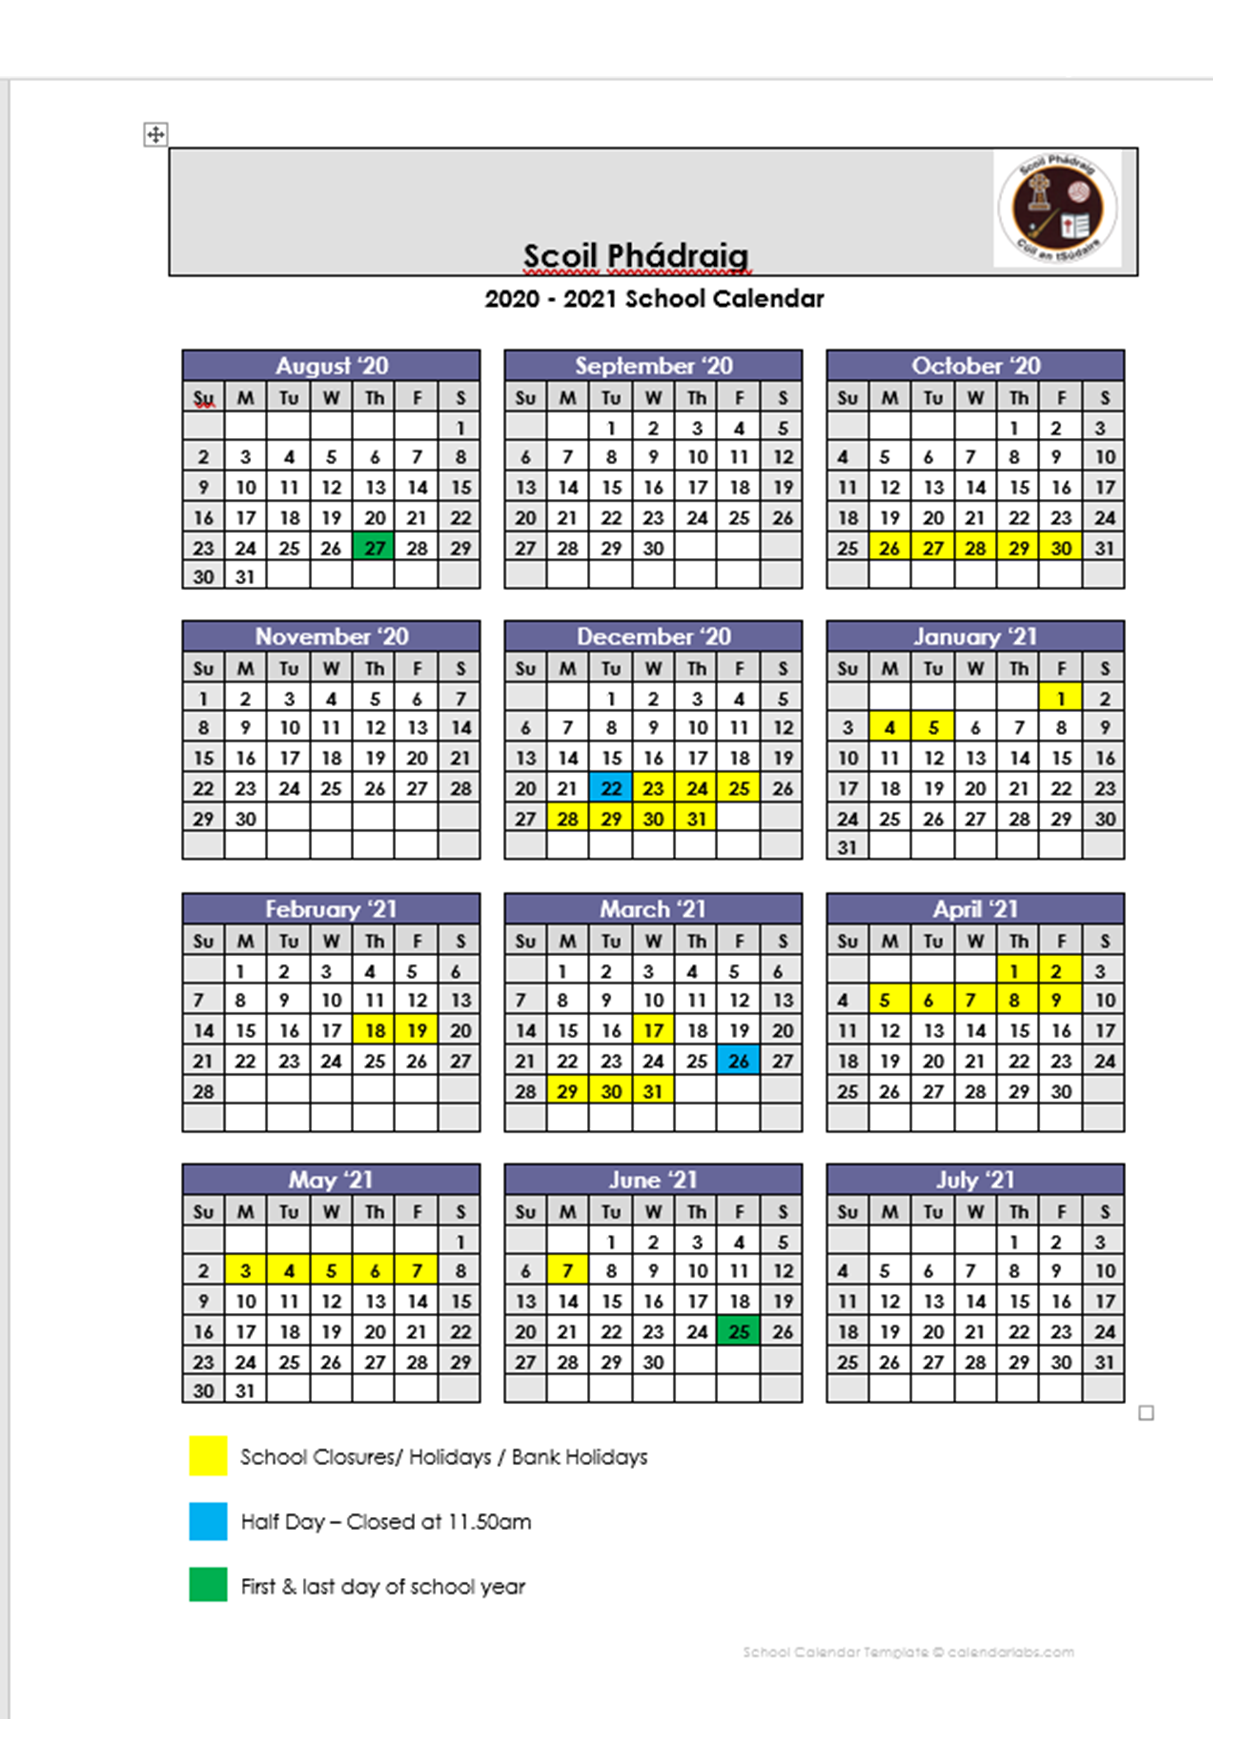 School Calendar 2020/2021 - St Patricks BNS